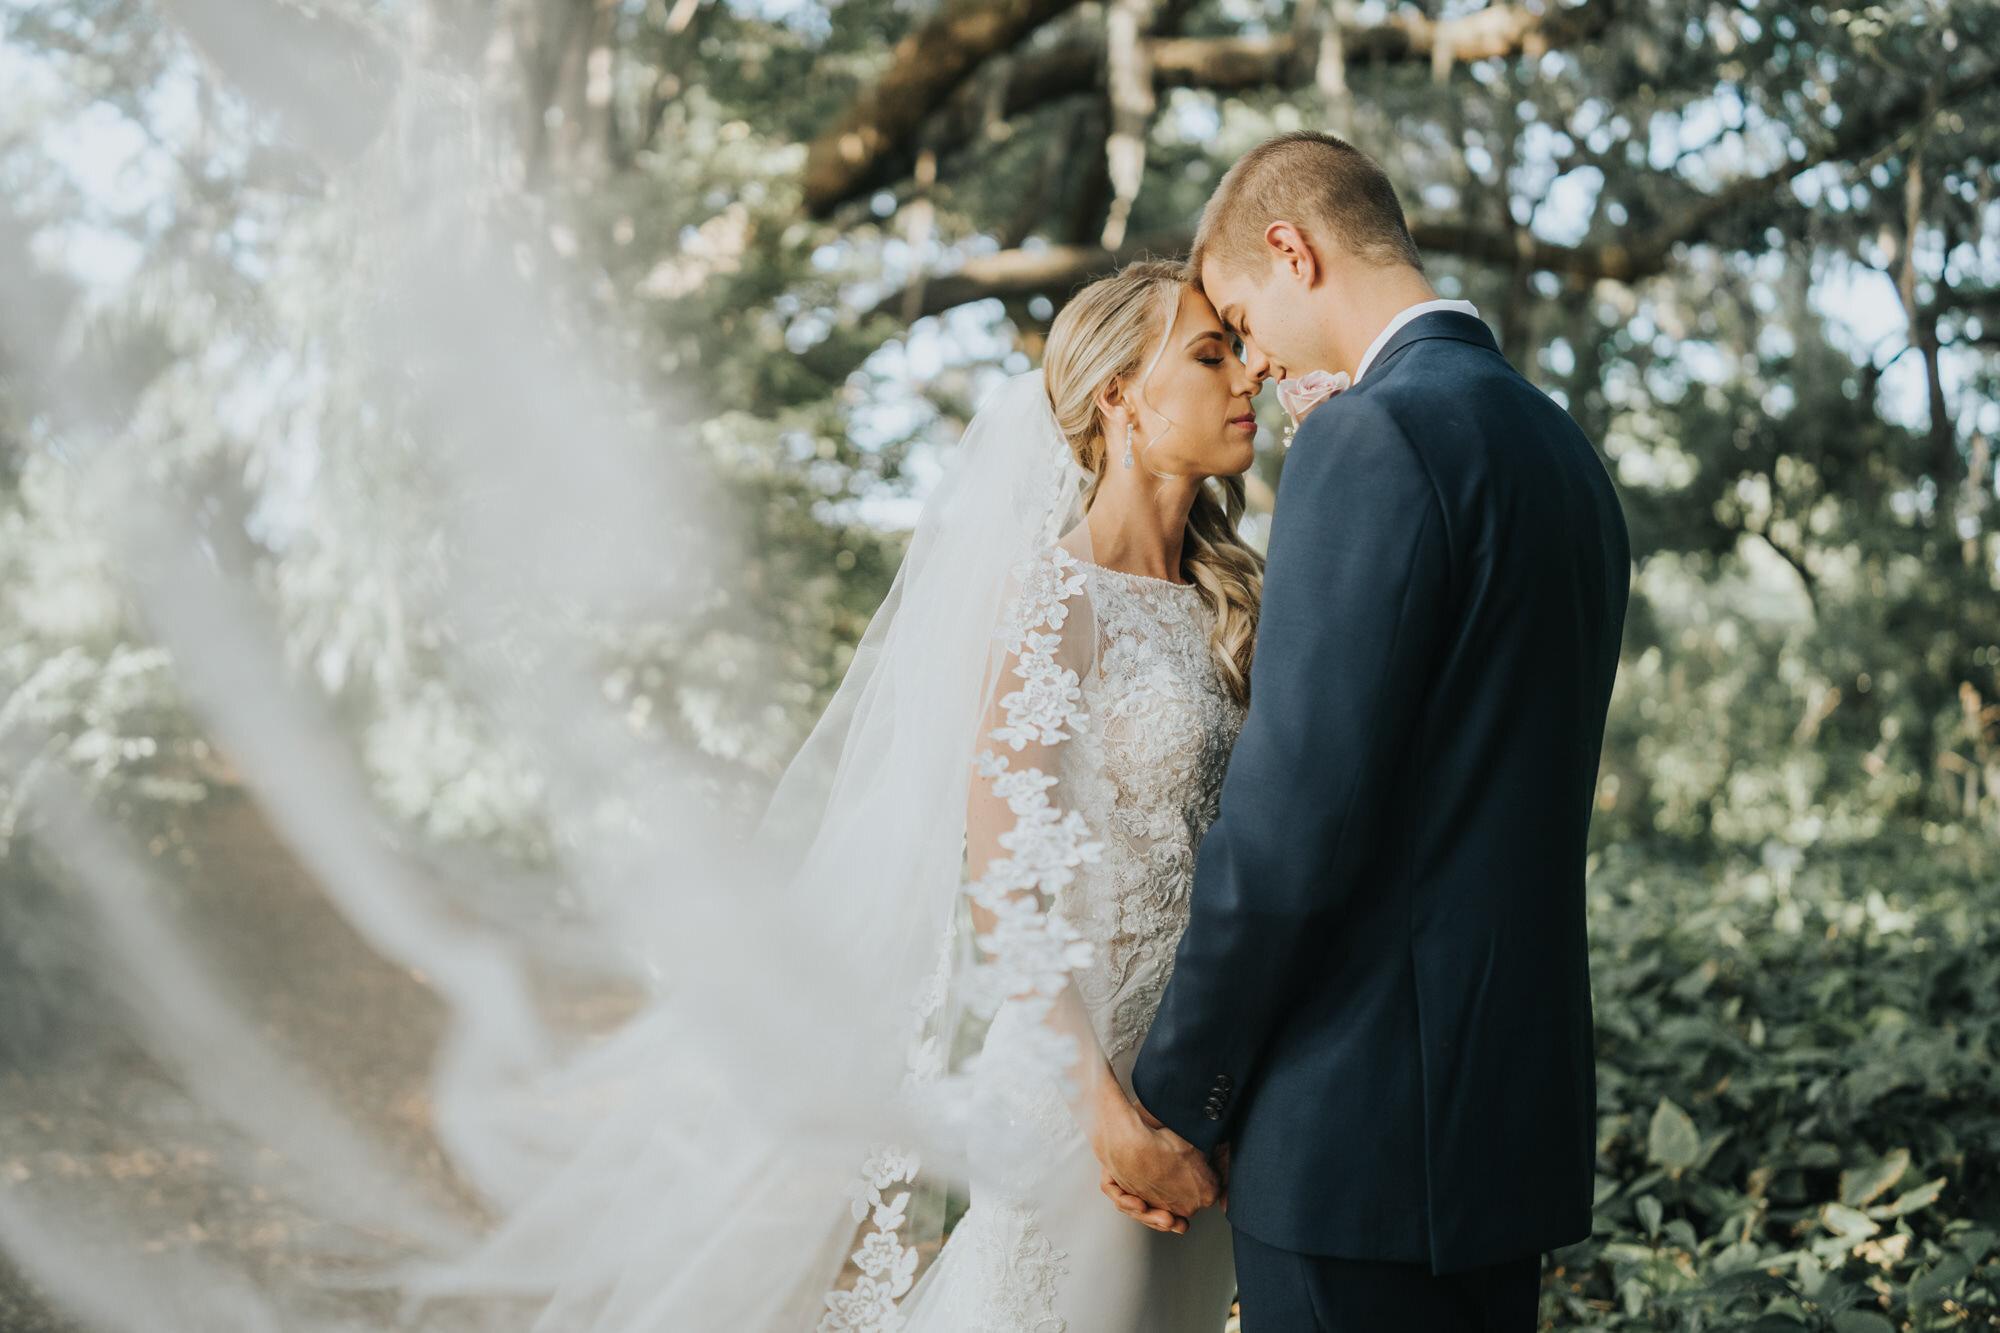 341Sean_Emily_Wedding_3-30-19.jpg